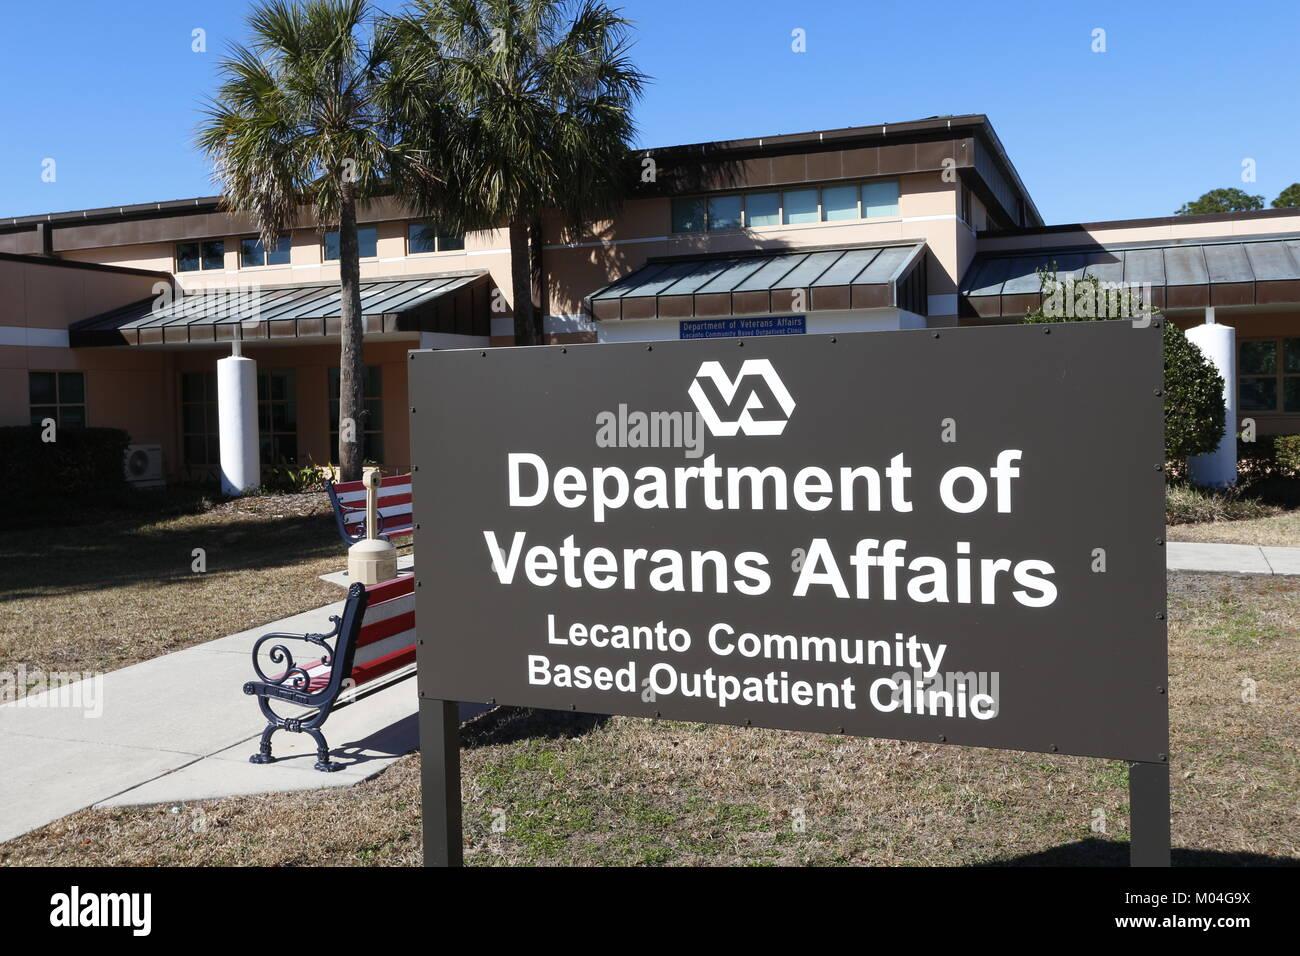 Department of Veterans Affairs sign, Lecanto, FL - Stock Image